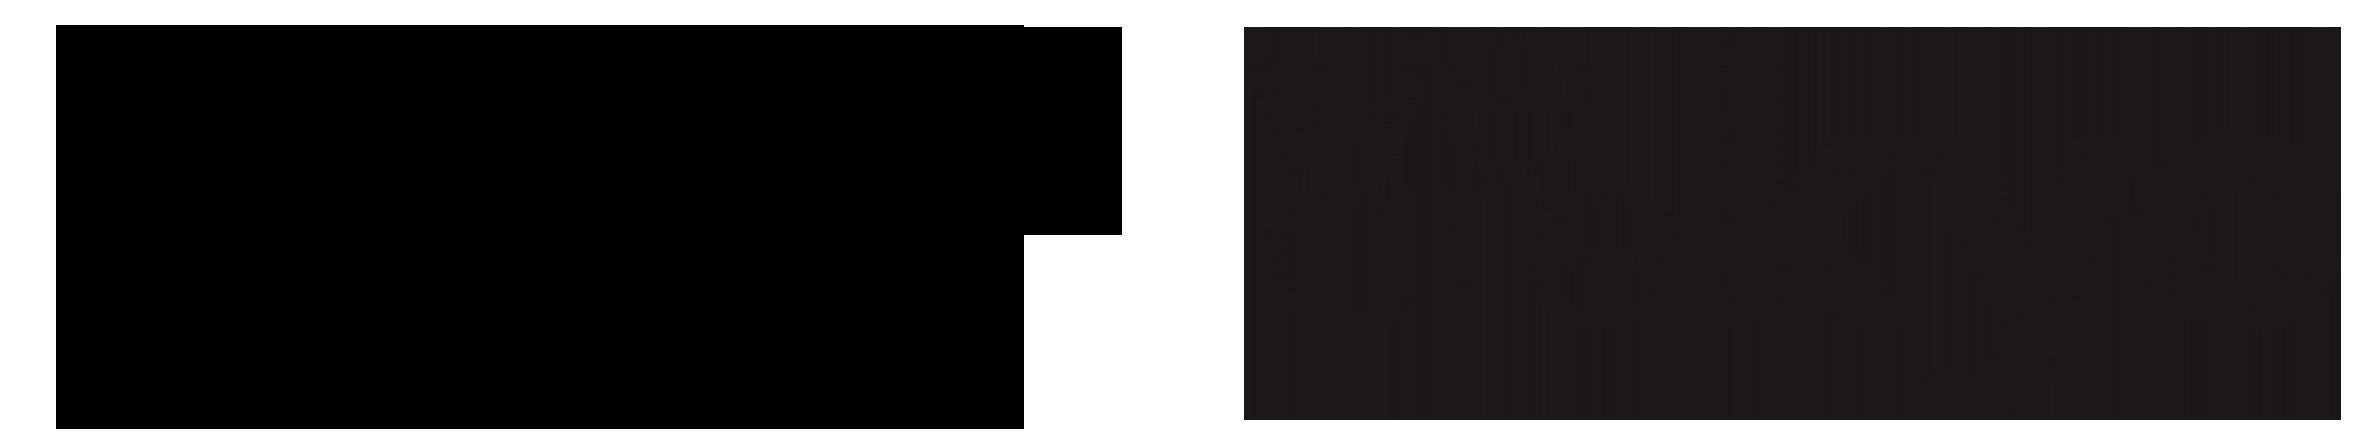 PROMOKANT promotions logo